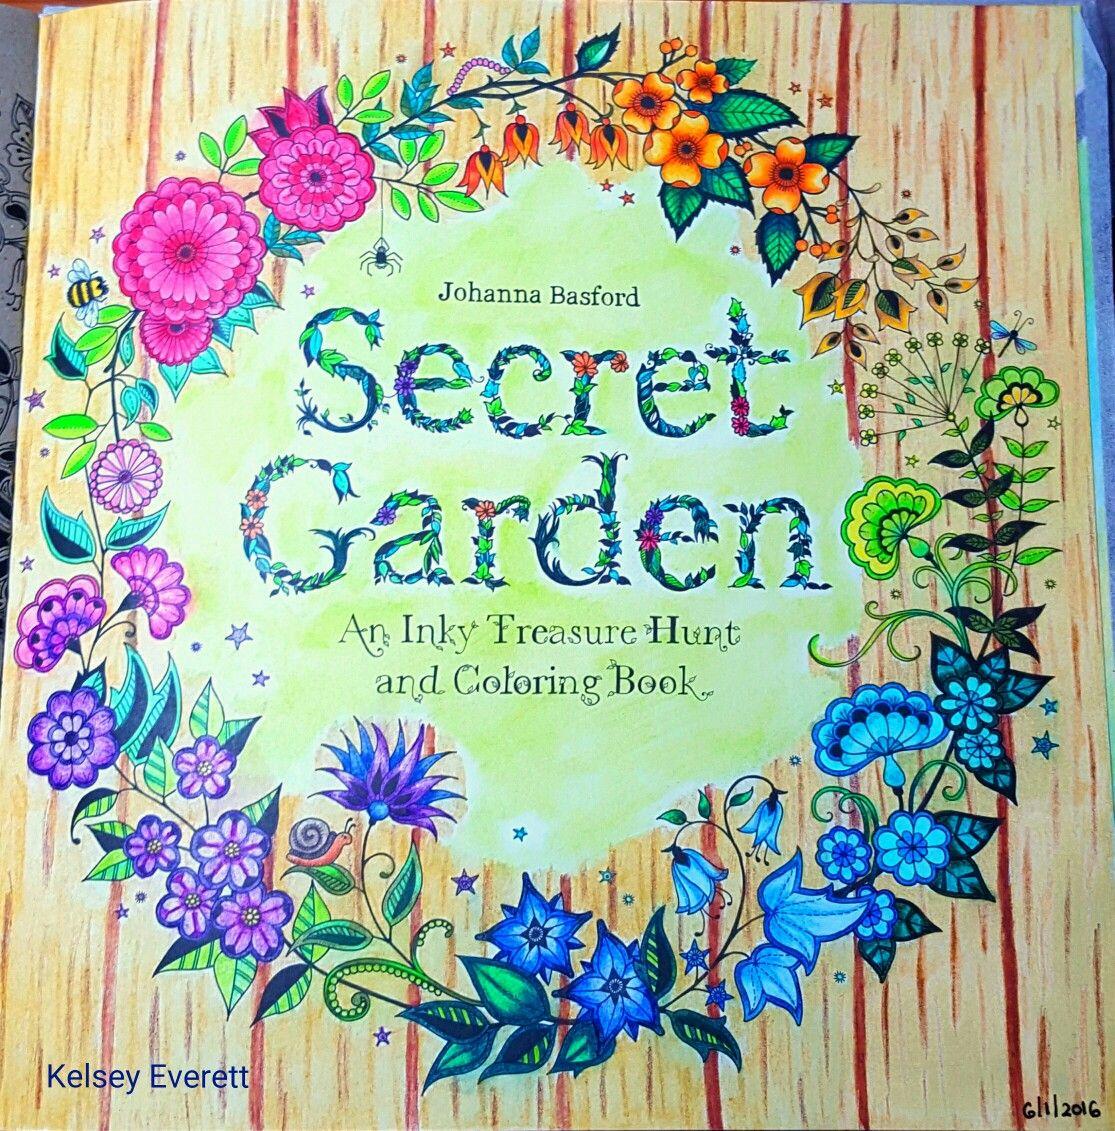 Johanna Basford S Secret Garden Coloring Book Title Page Colored By Kelsey Ev Secret Garden Coloring Book Johanna Basford Secret Garden Secret Garden Colouring